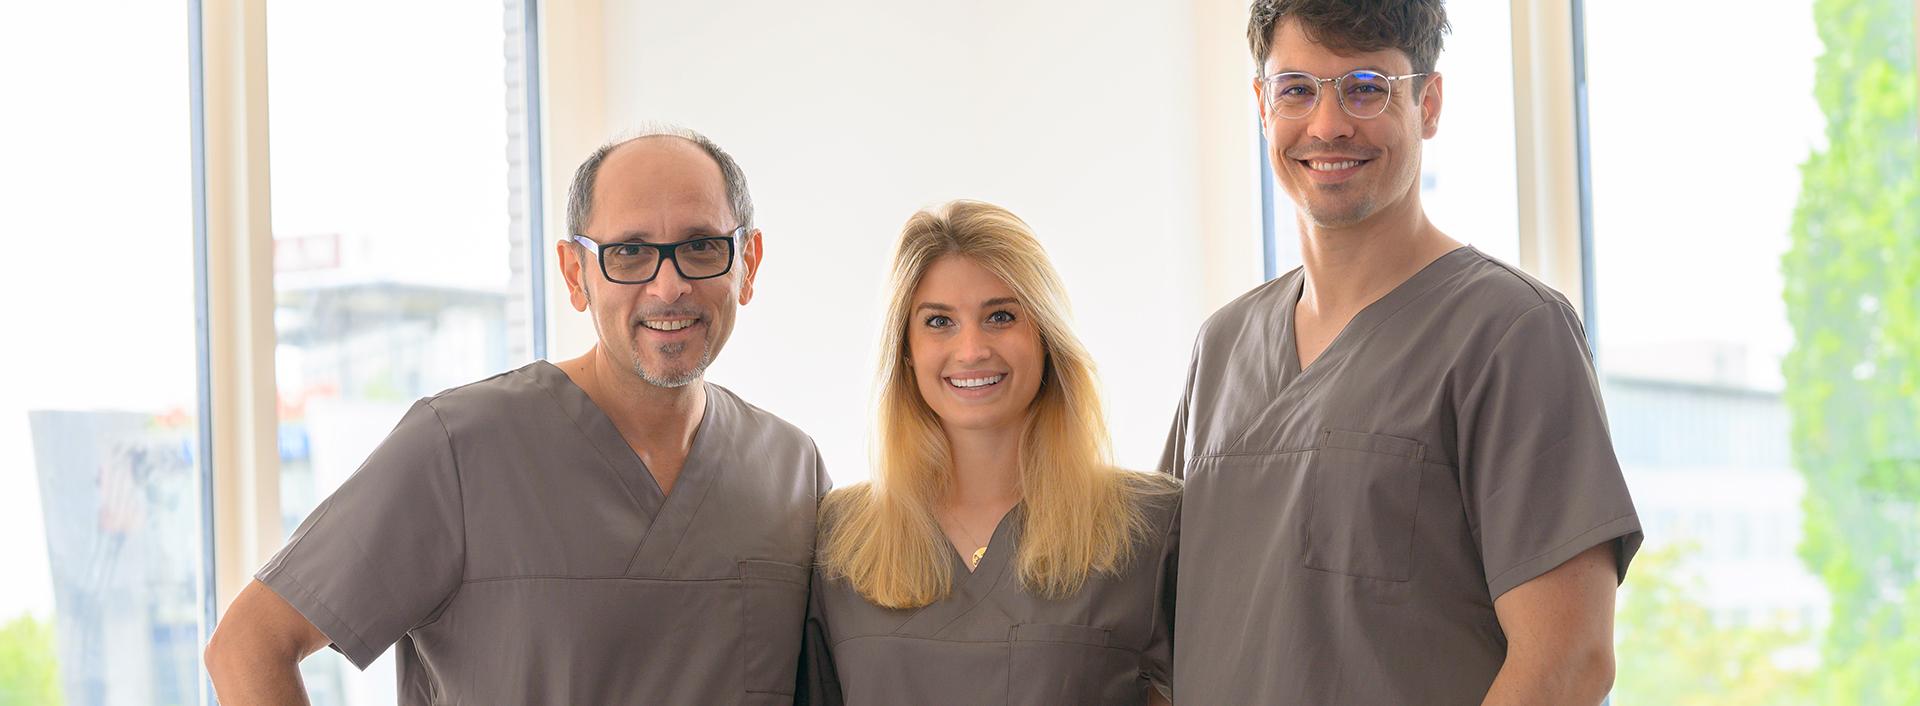 Ärzte Team Herr Dr. Ozren König, Herr Dr. Sebastijan Mormer und Frau Dr. Antonia Herrmann